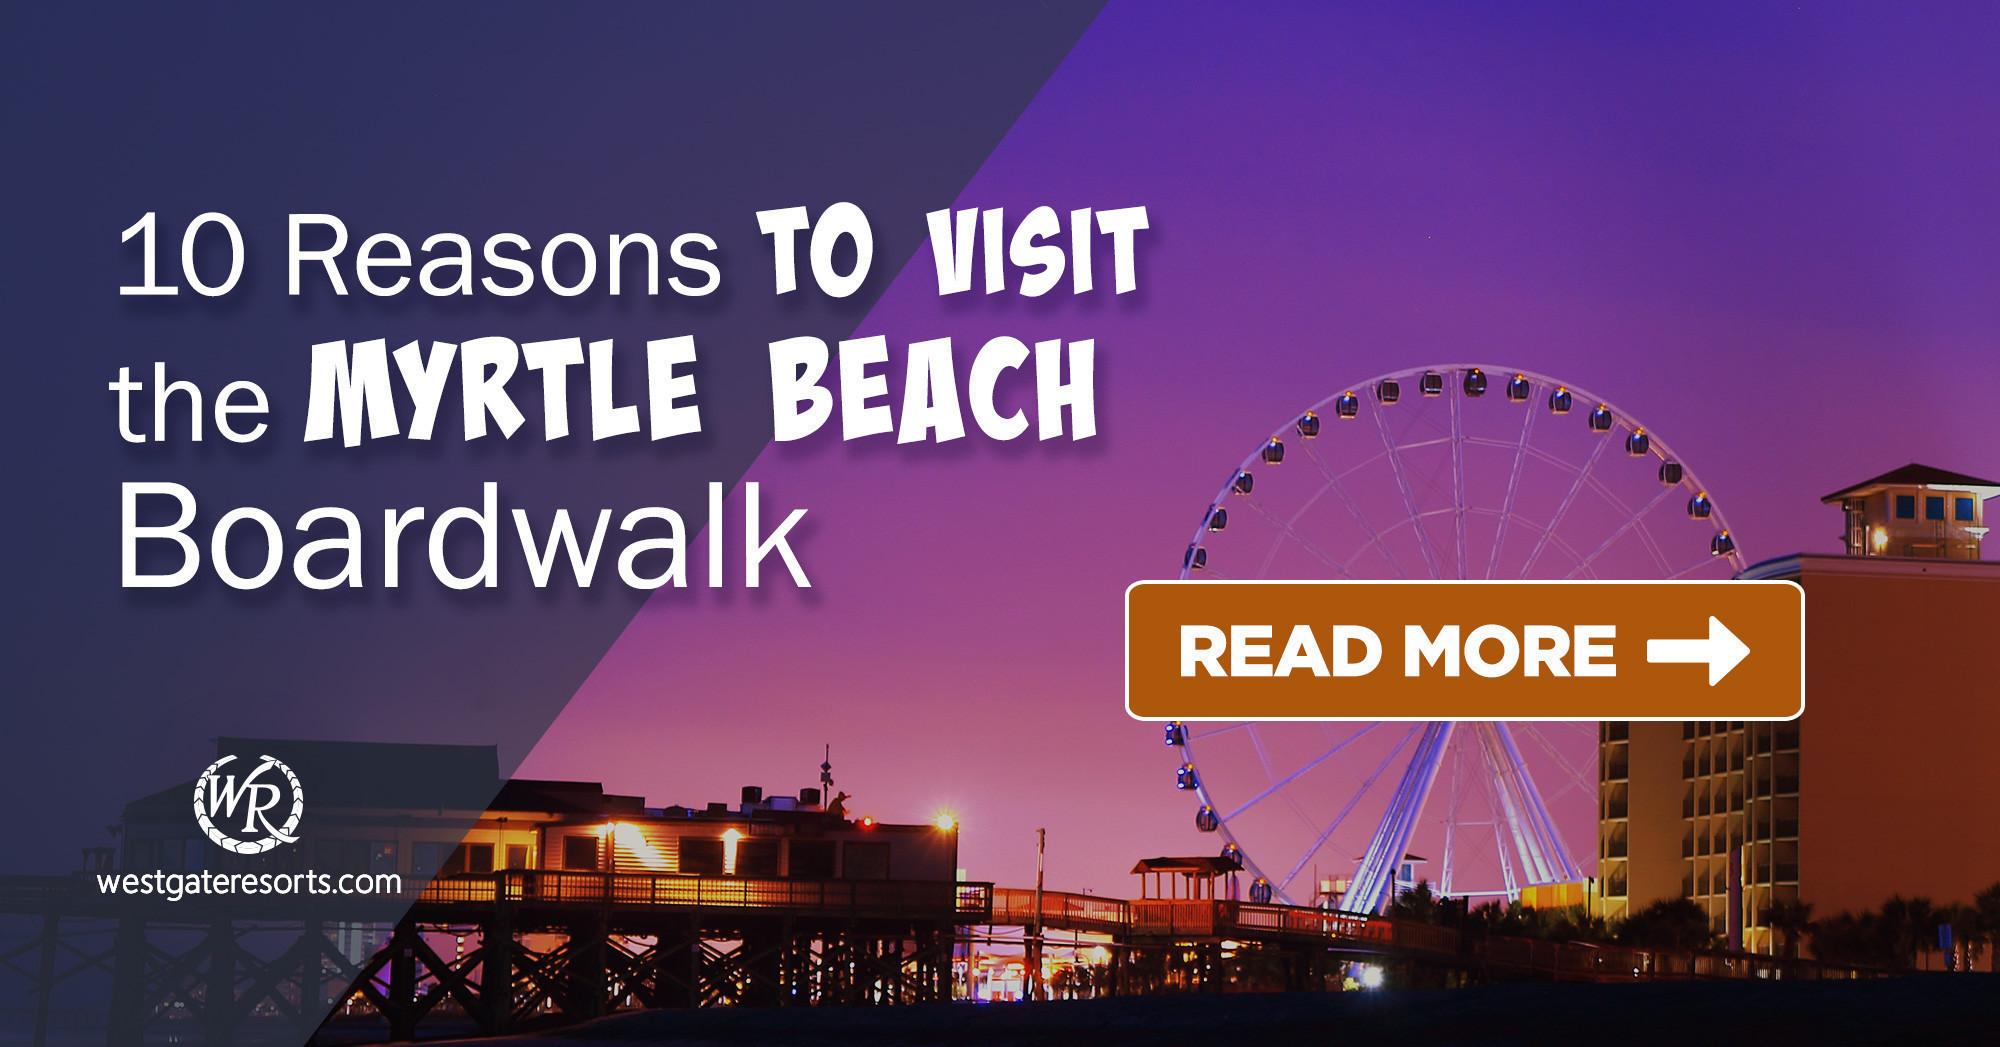 10 Reasons to Visit the Myrtle Beach Boardwalk